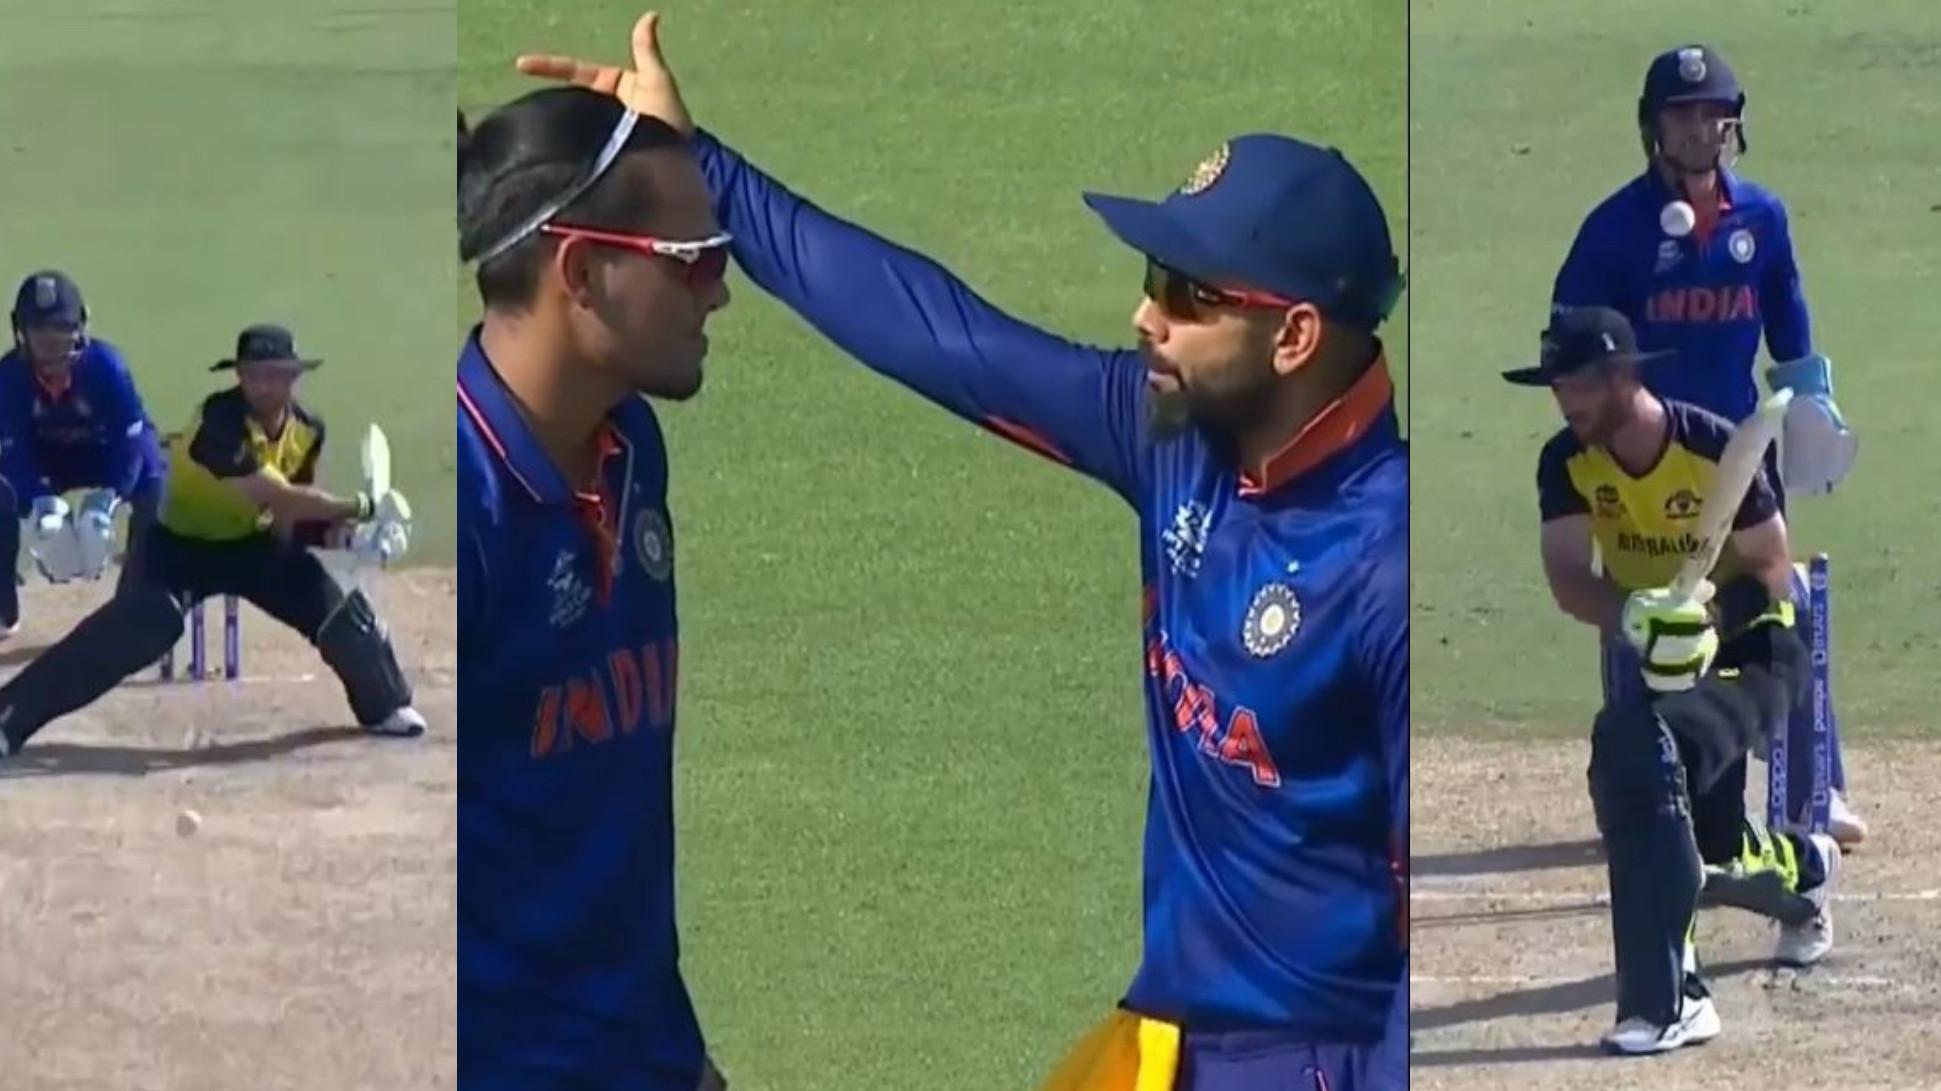 T20 World Cup 2021: WATCH- Virat Kohli's instructions help Rahul Chahar one-up Glenn Maxwell